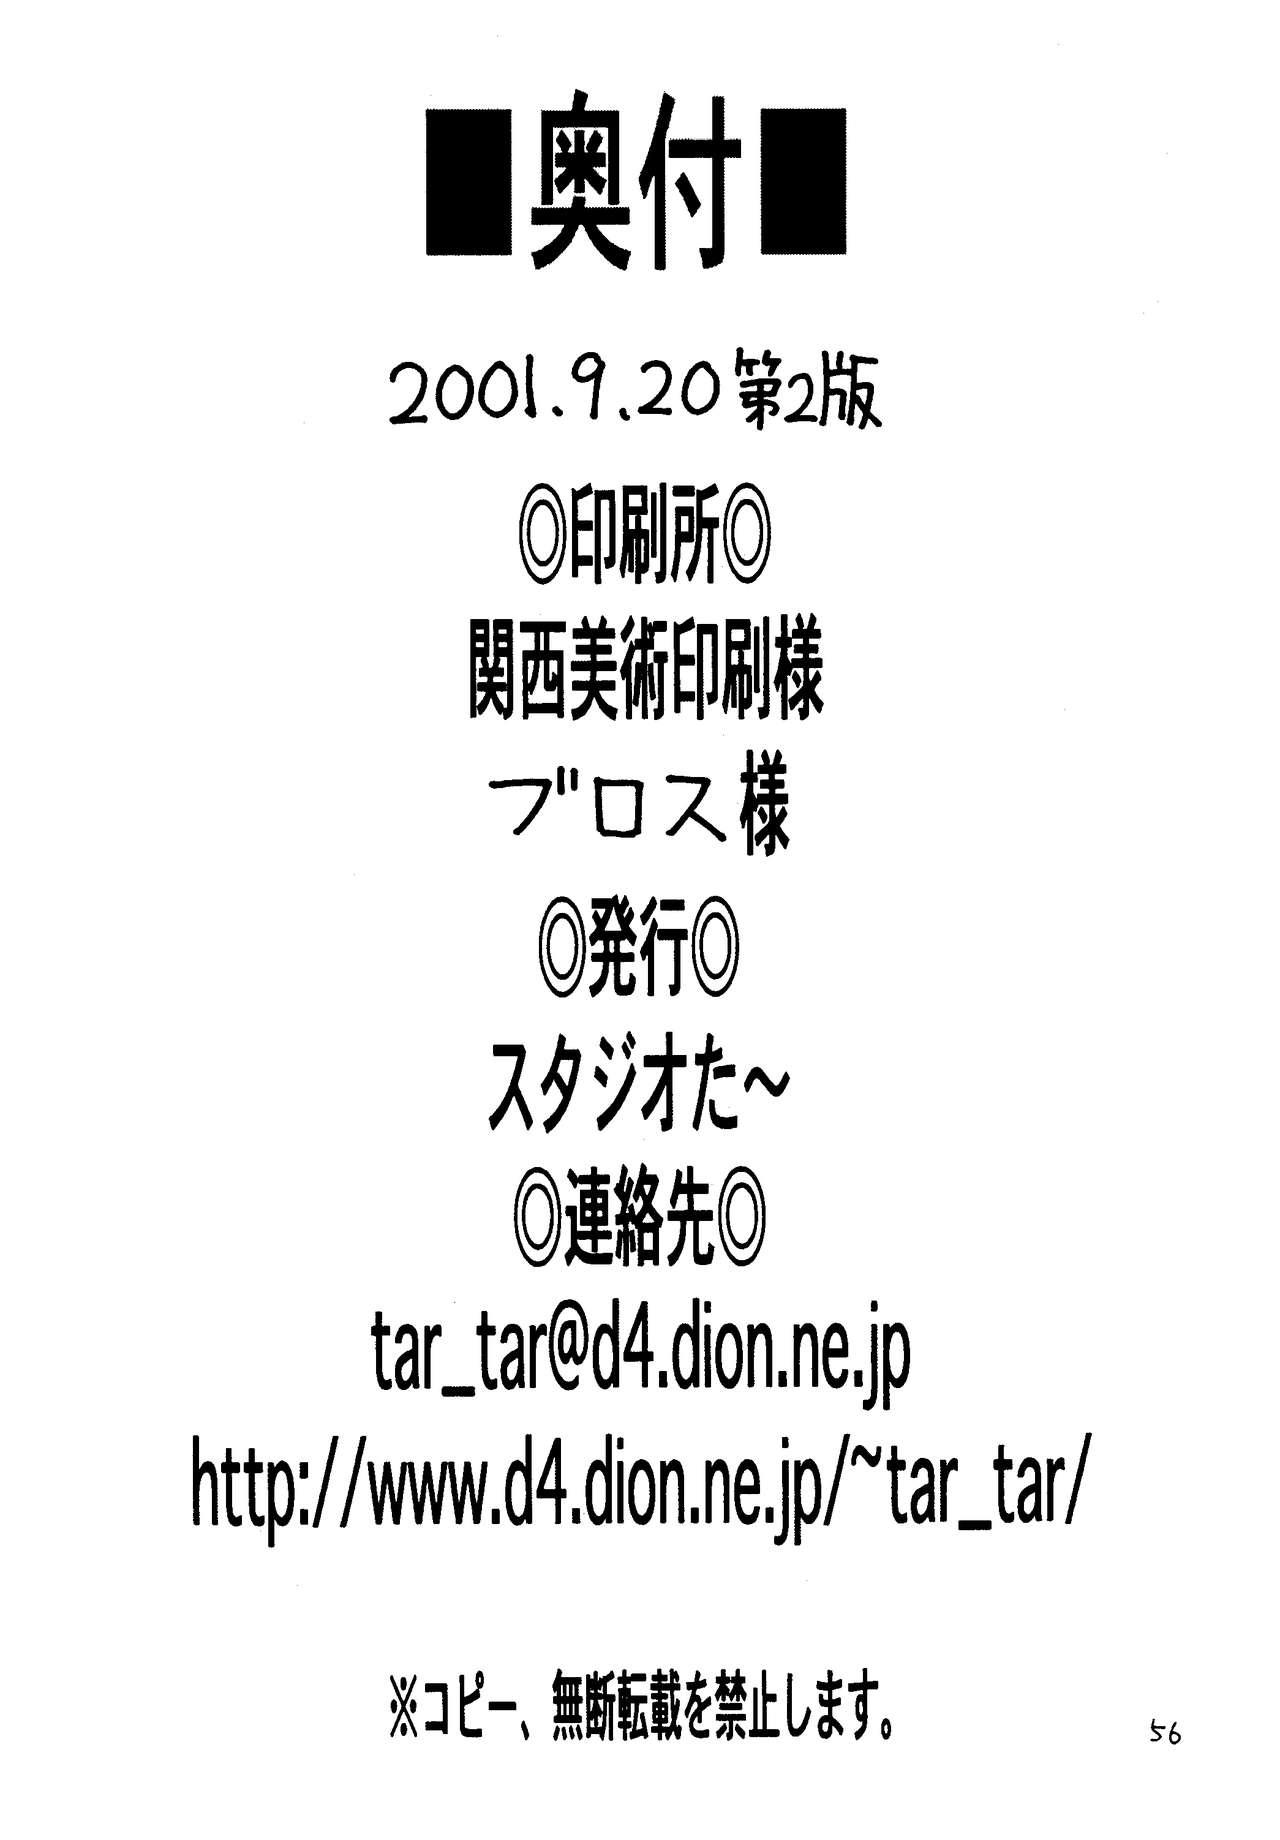 Jou-kun, Juken de Ketsukacchin. 54